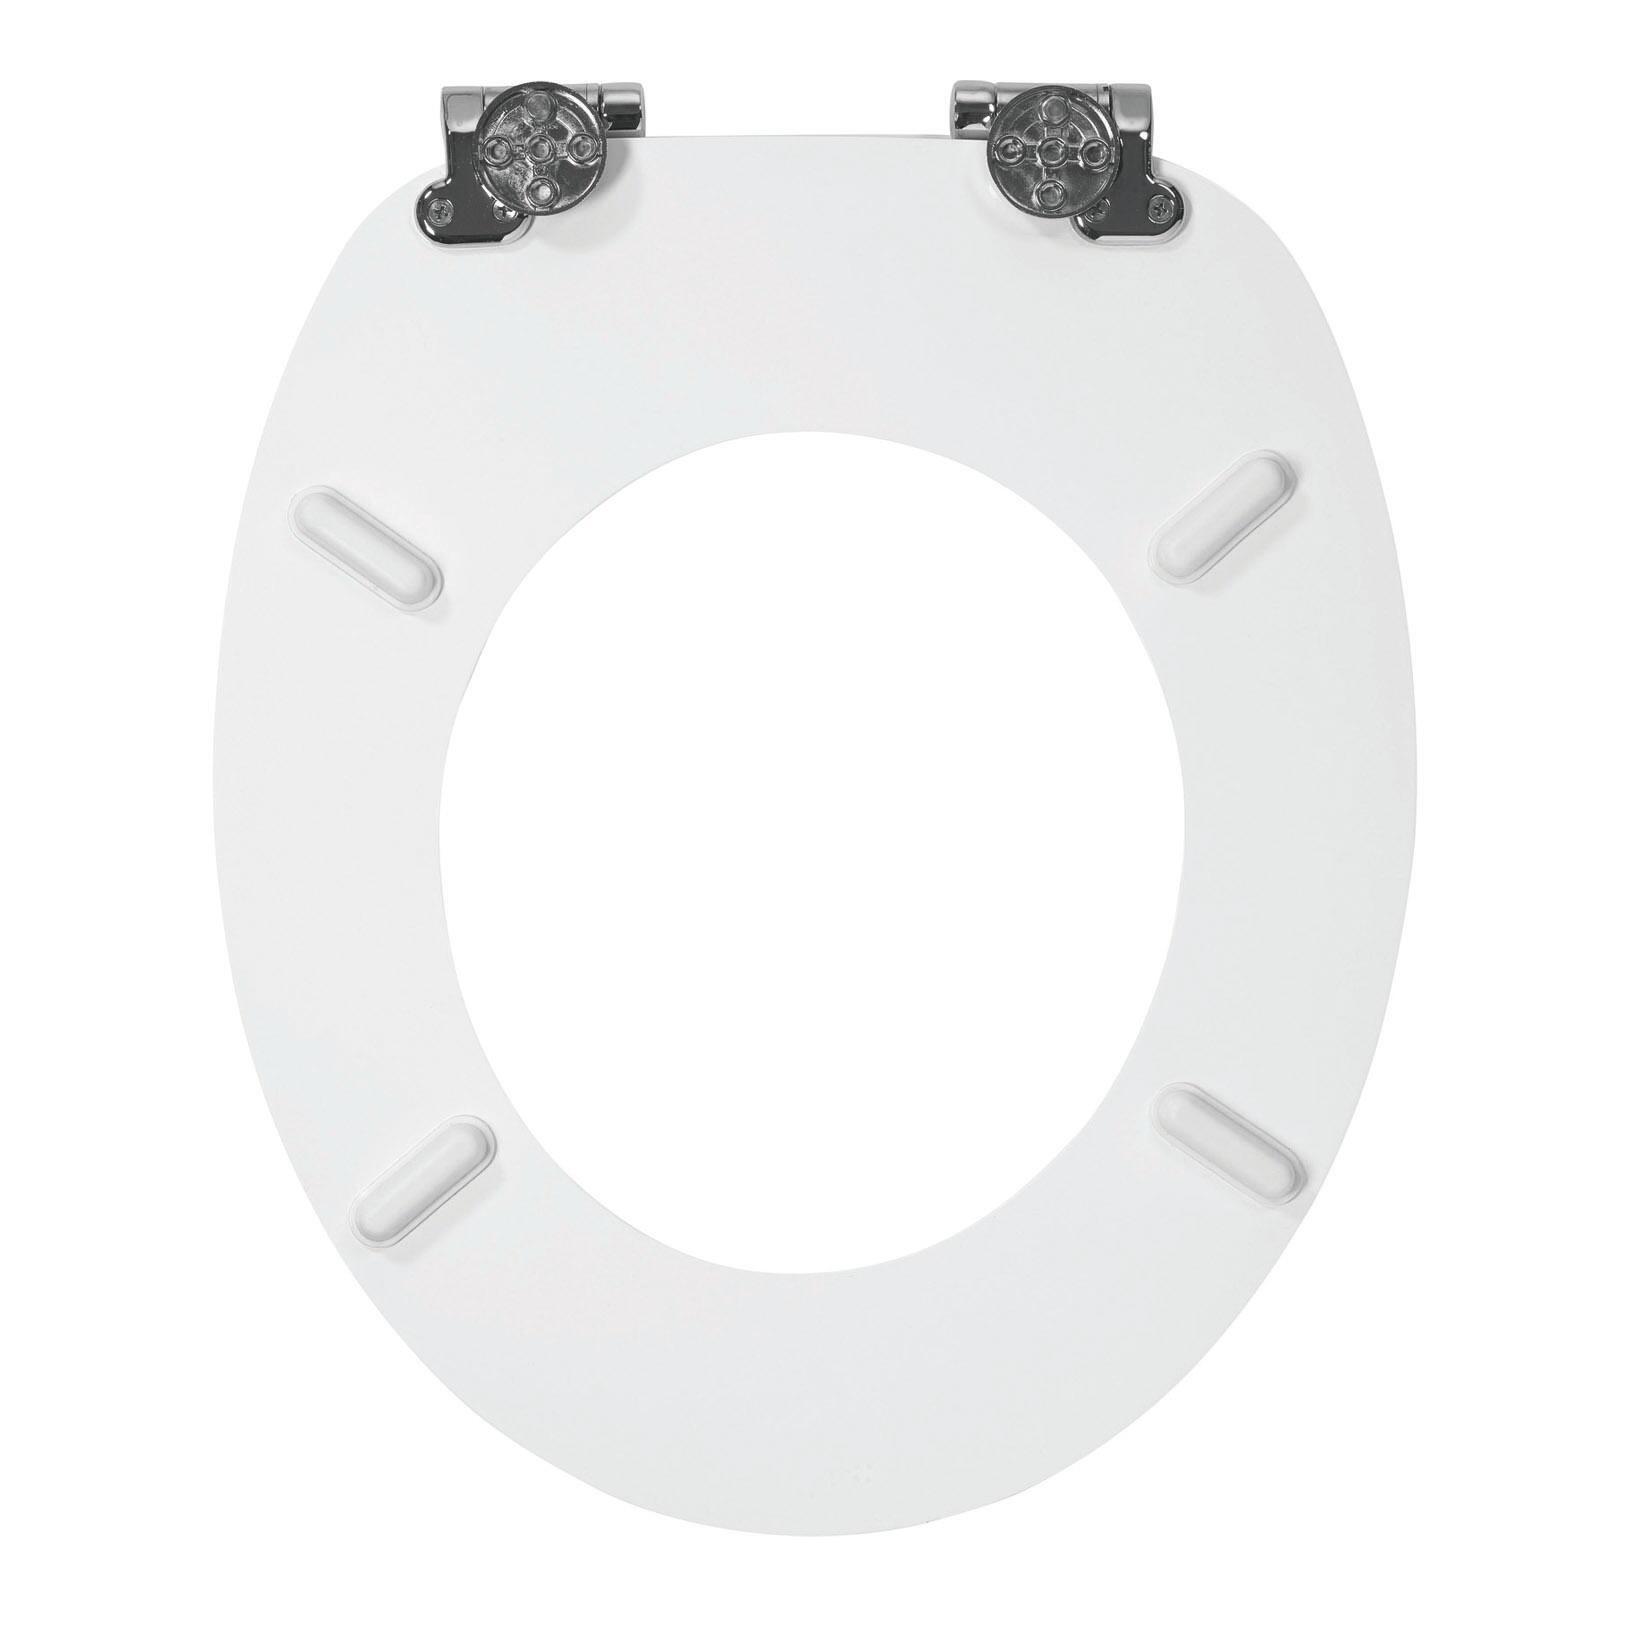 Copriwater ovale Universale Woody WIRQUIN legno massello bianco - 6